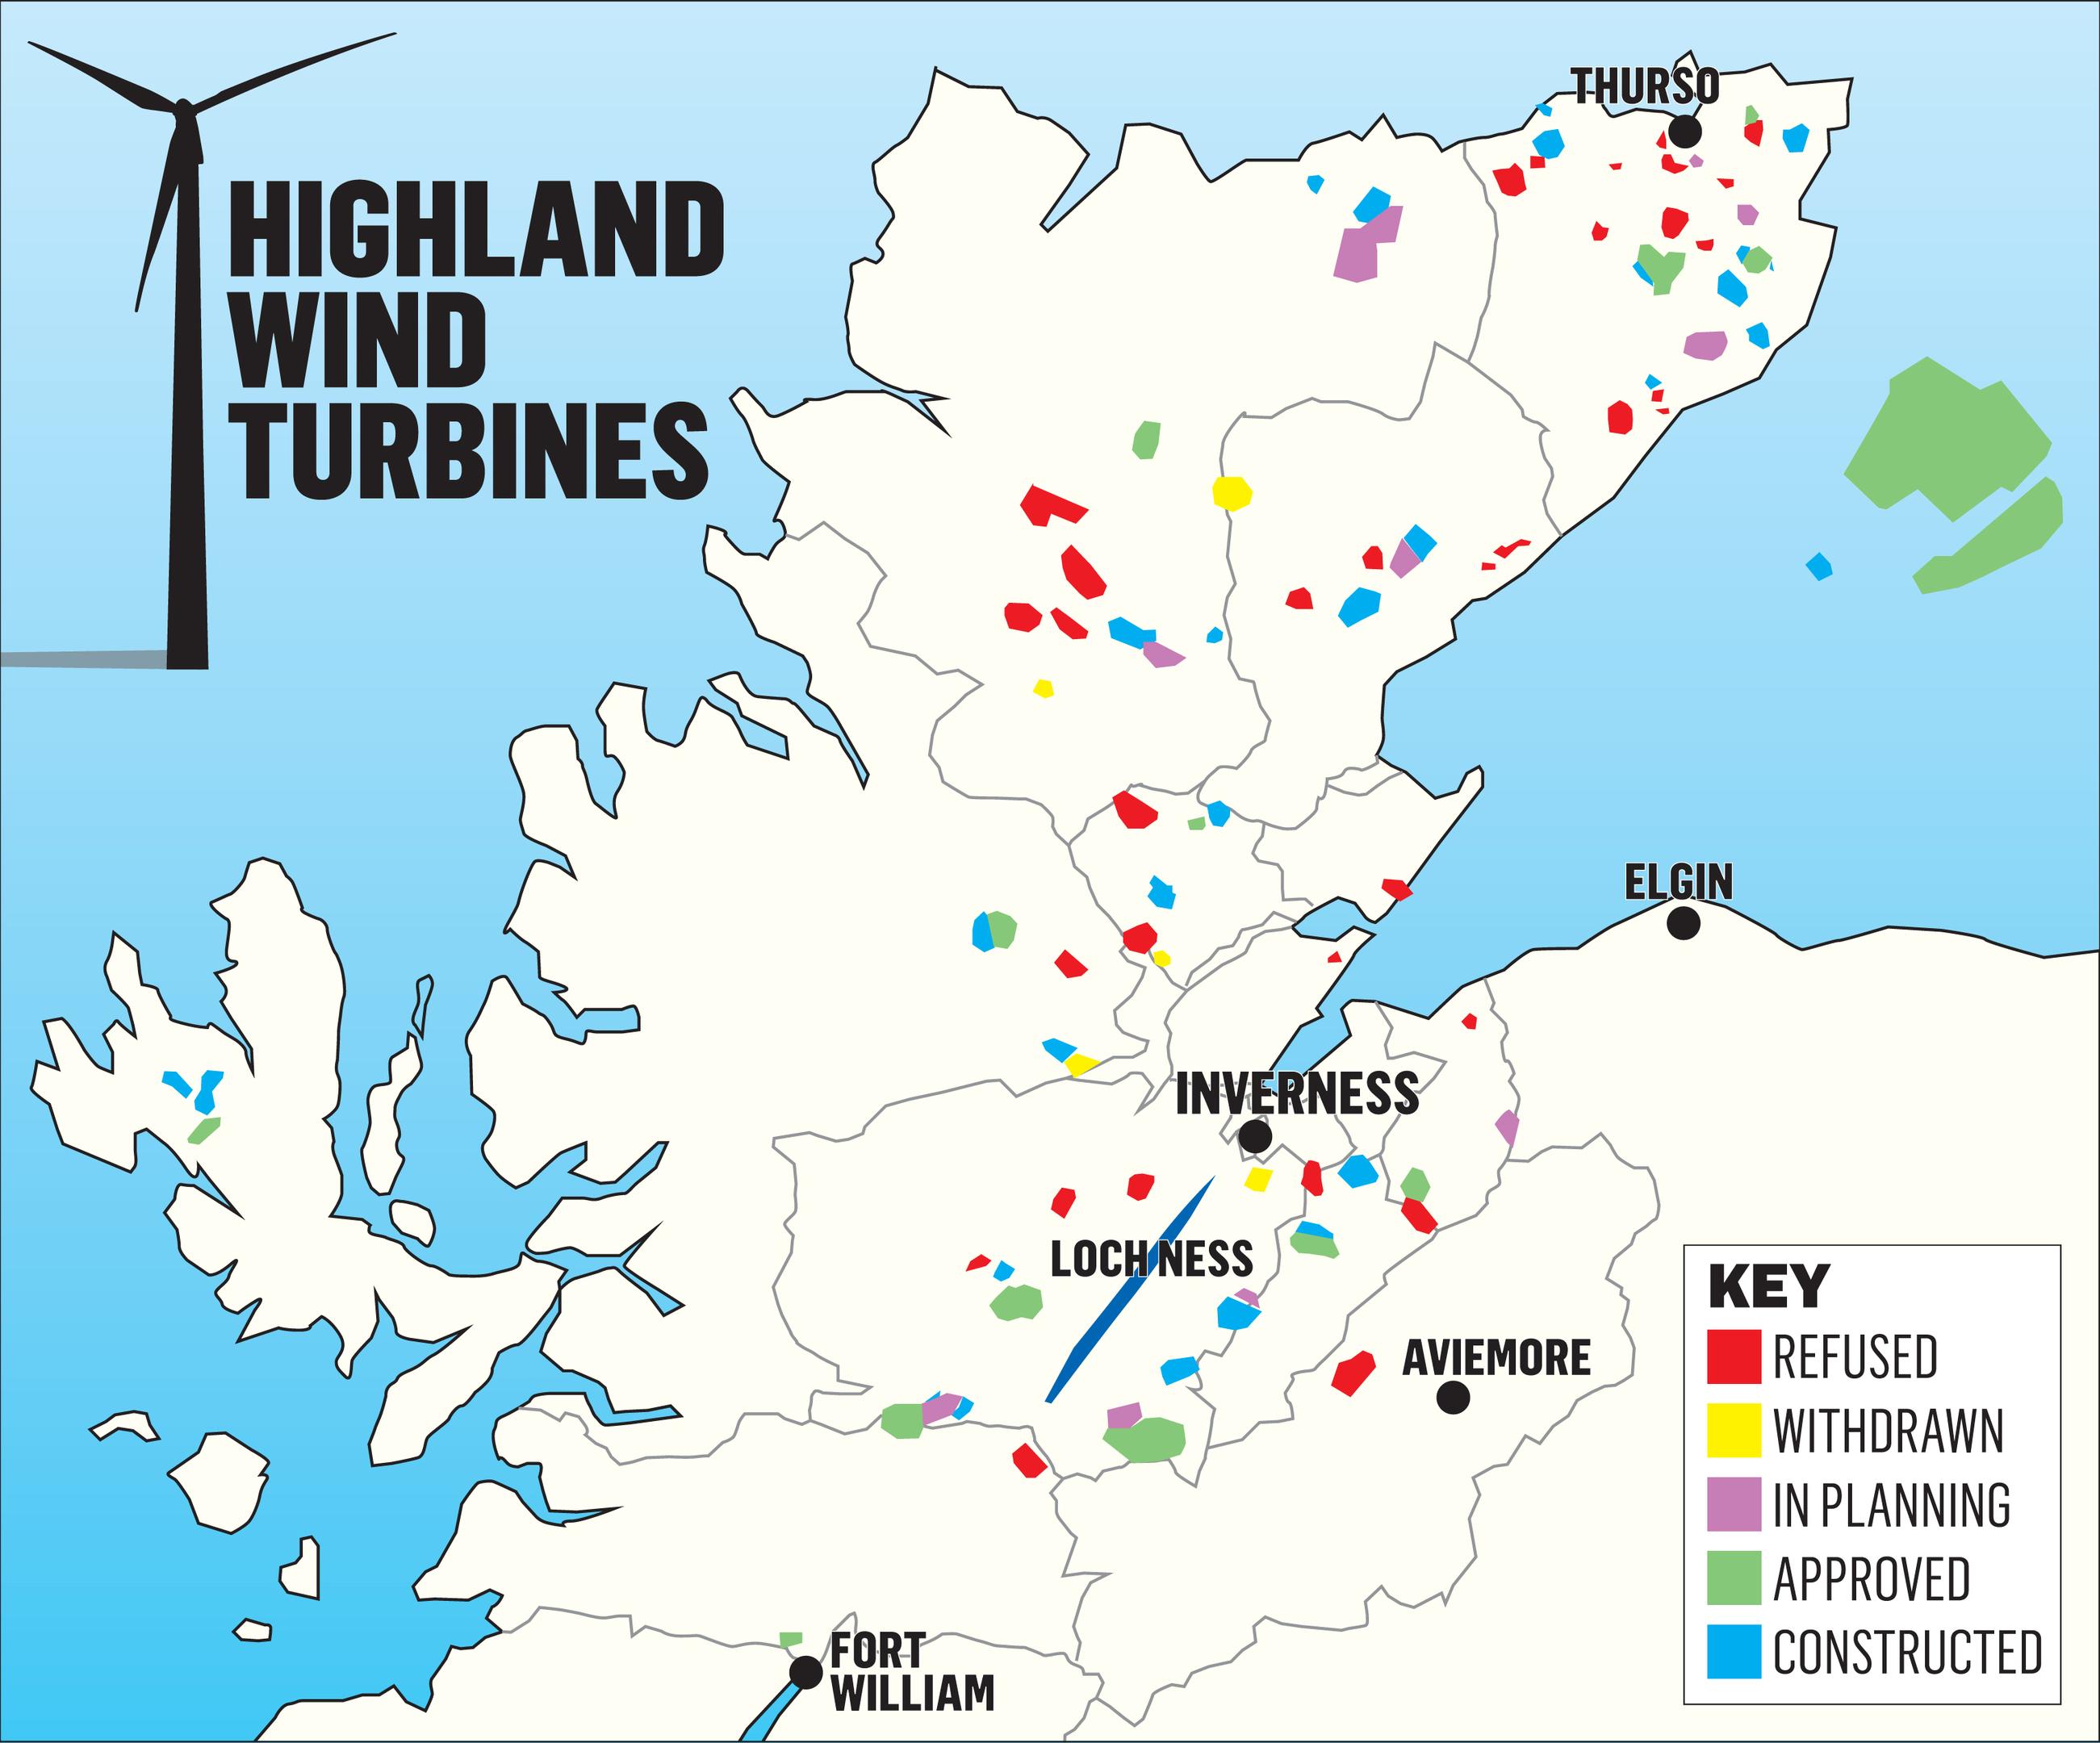 Windfarm map